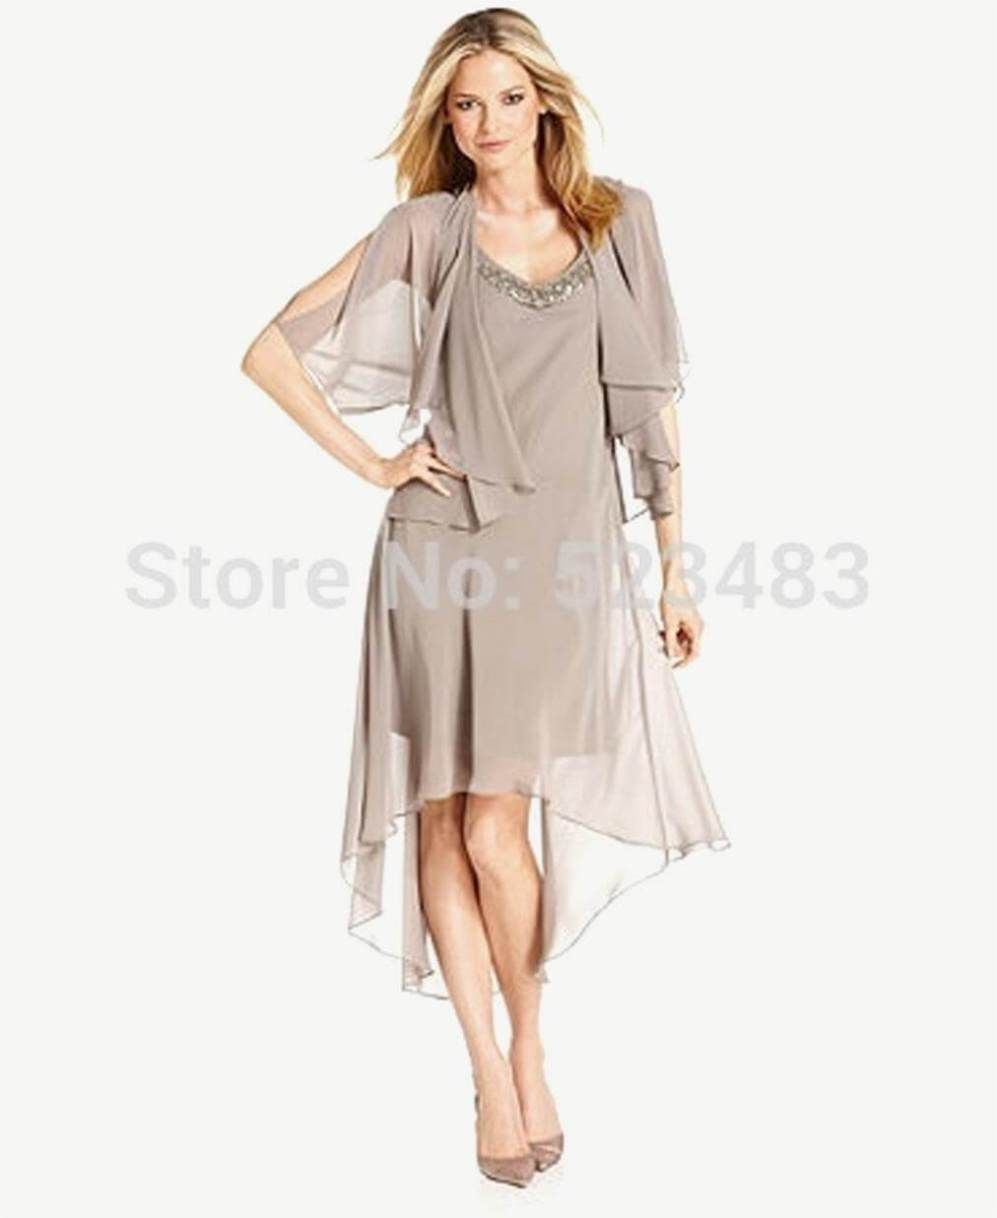 3cd35b979bc9 30+ Beautiful Macys Dresses For Wedding Guests Ideas | Wedding ...